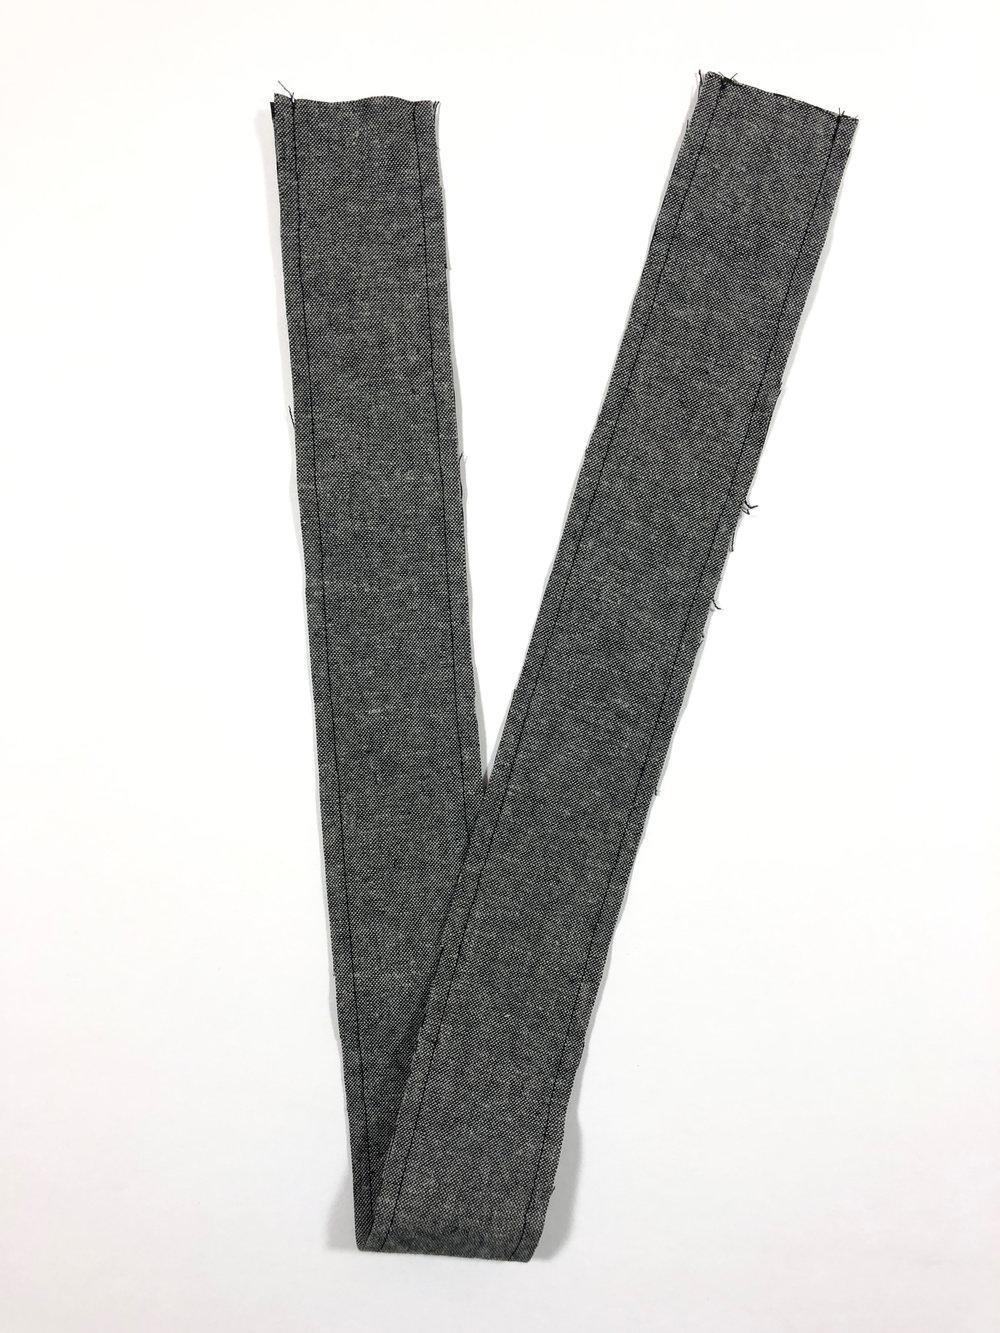 "62. Sew bib straps together with 1/4"" seam allowance."